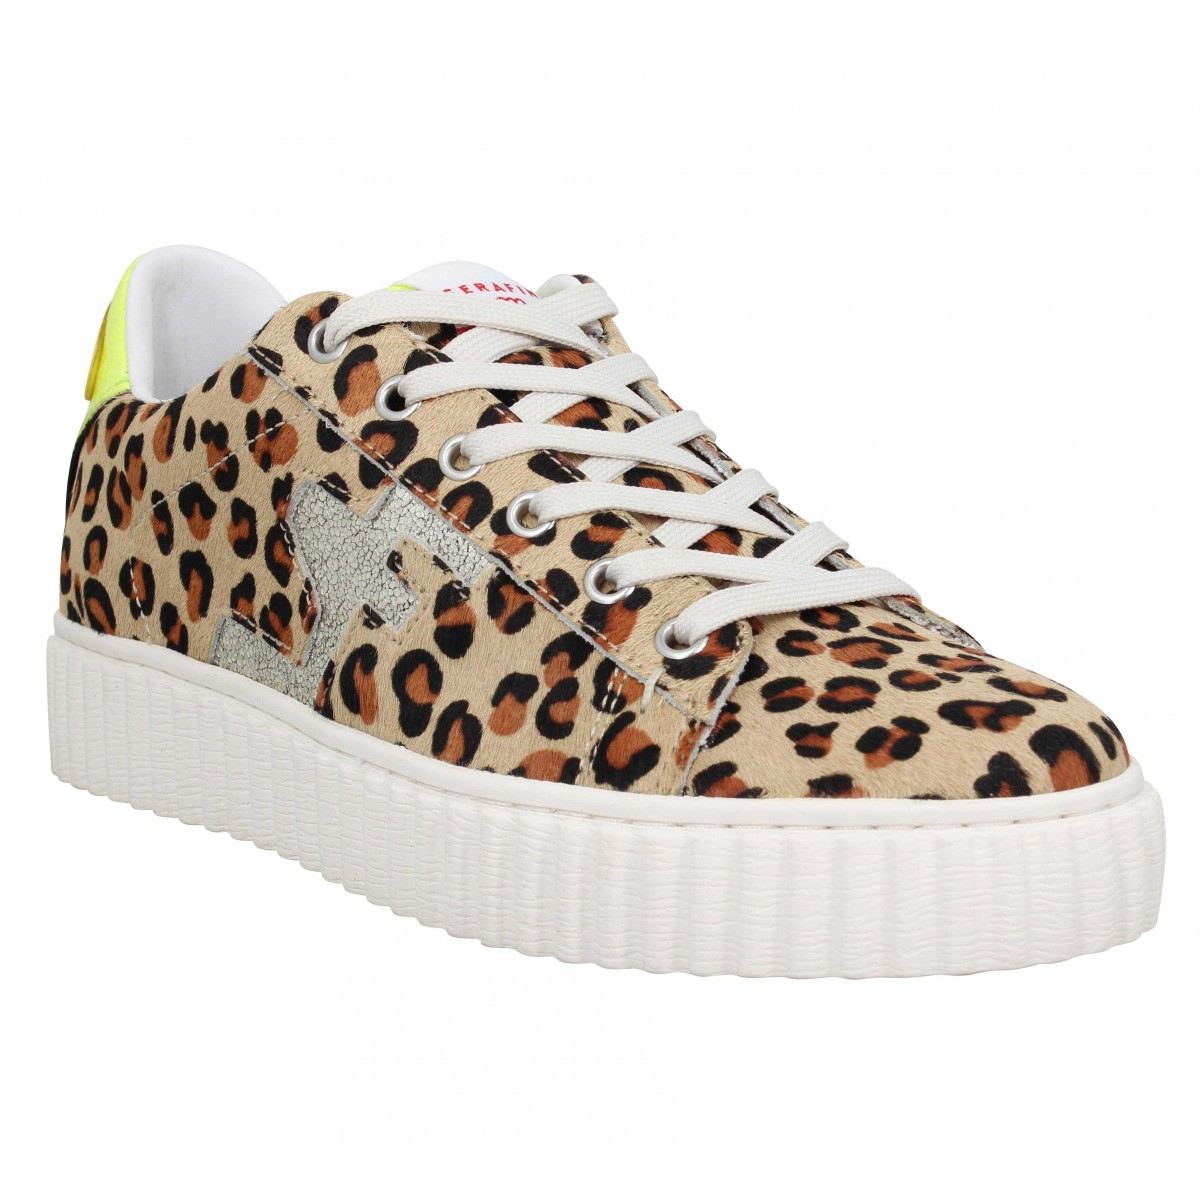 Baskets SERAFINI Madison velours Femme Leopard